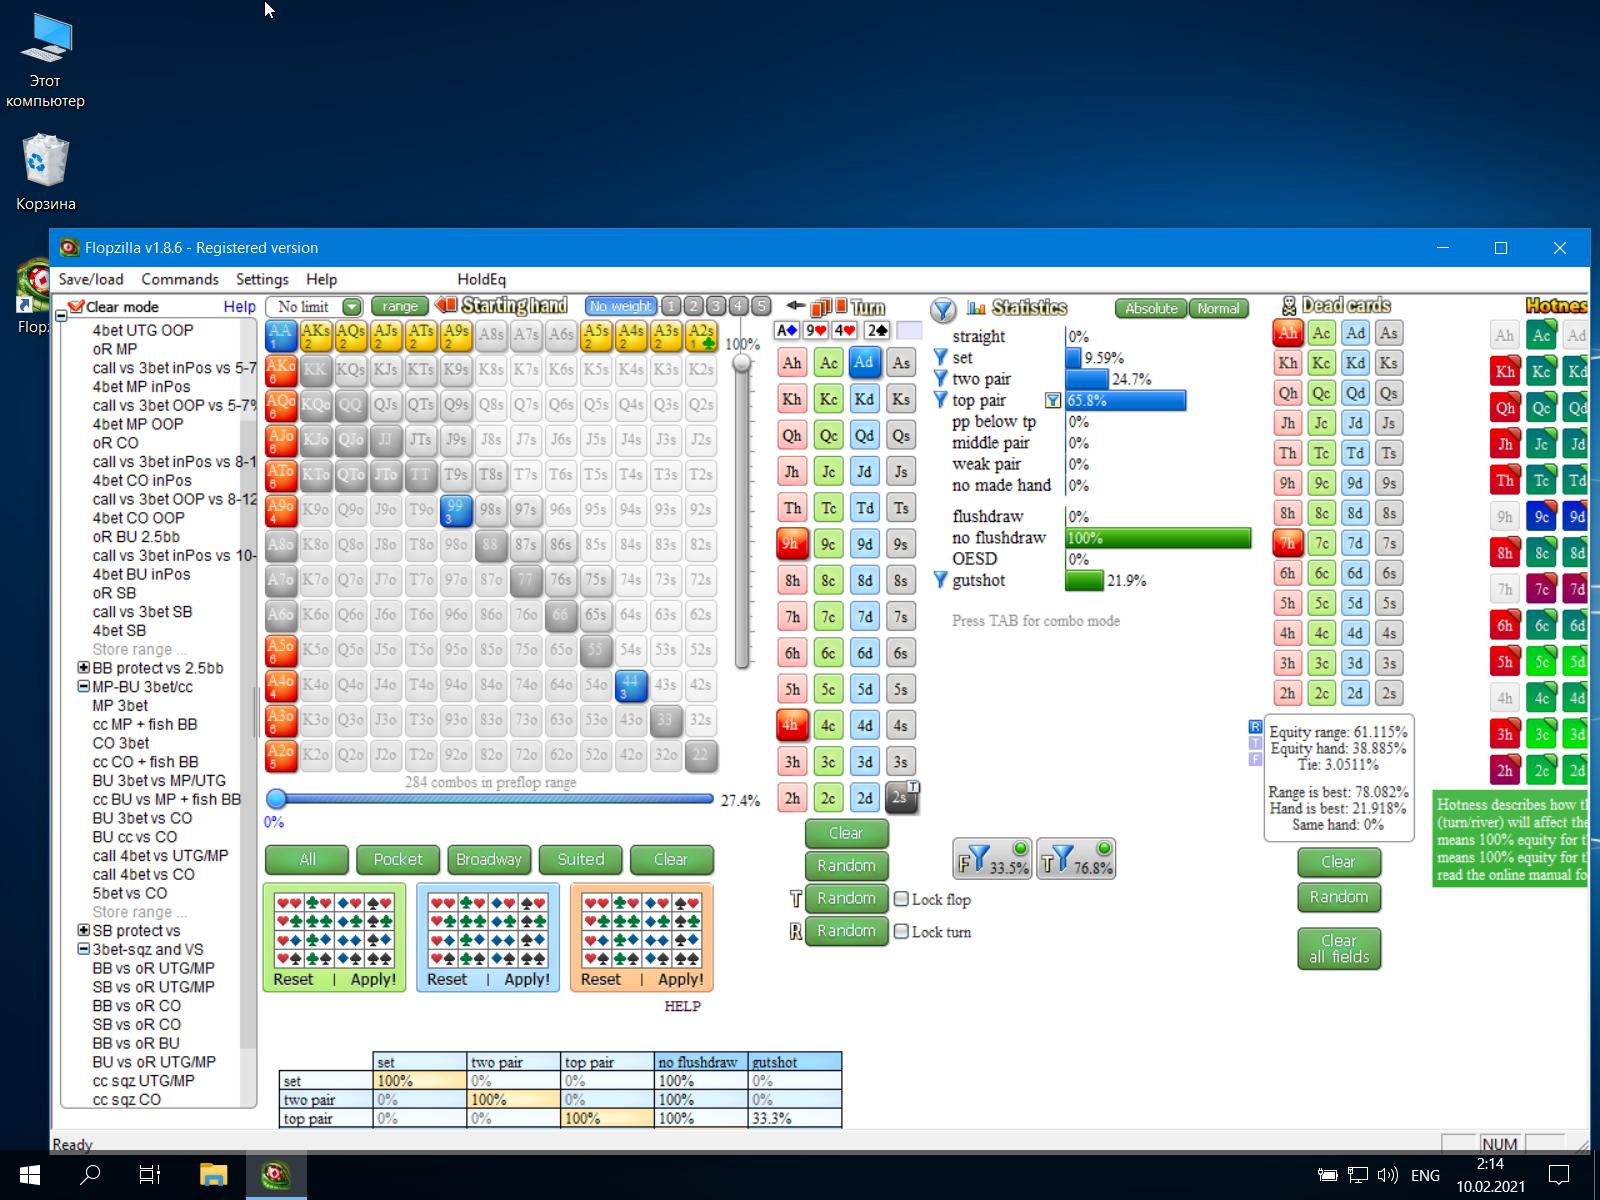 virtualboxwin-10100220210214371612912495.png